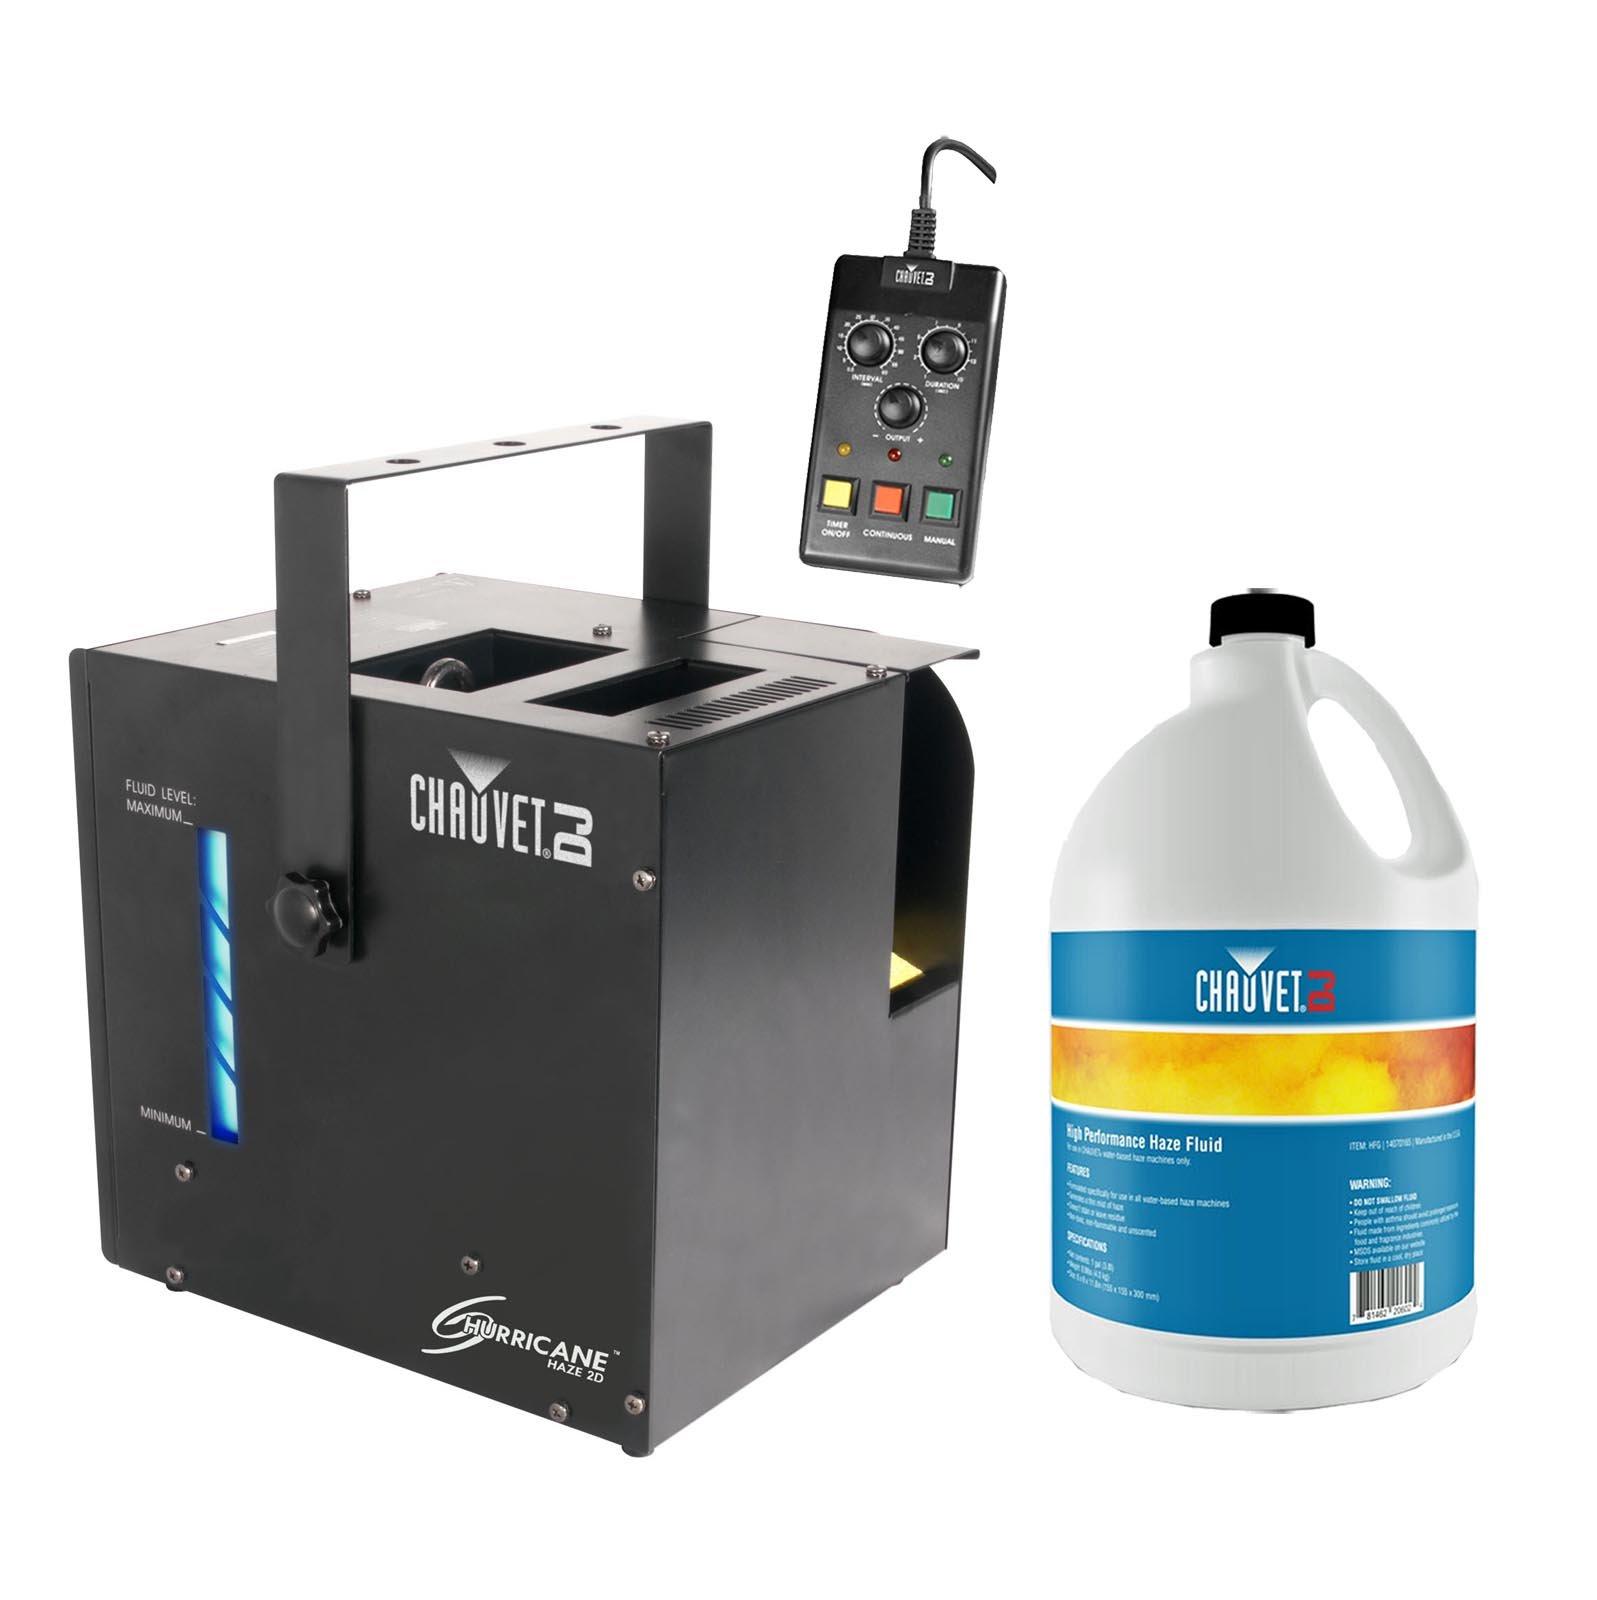 CHAUVET Hurricane Haze 2D Water-Based DJ Haze/Smoke/Fog Machine w/Remote + Fluid